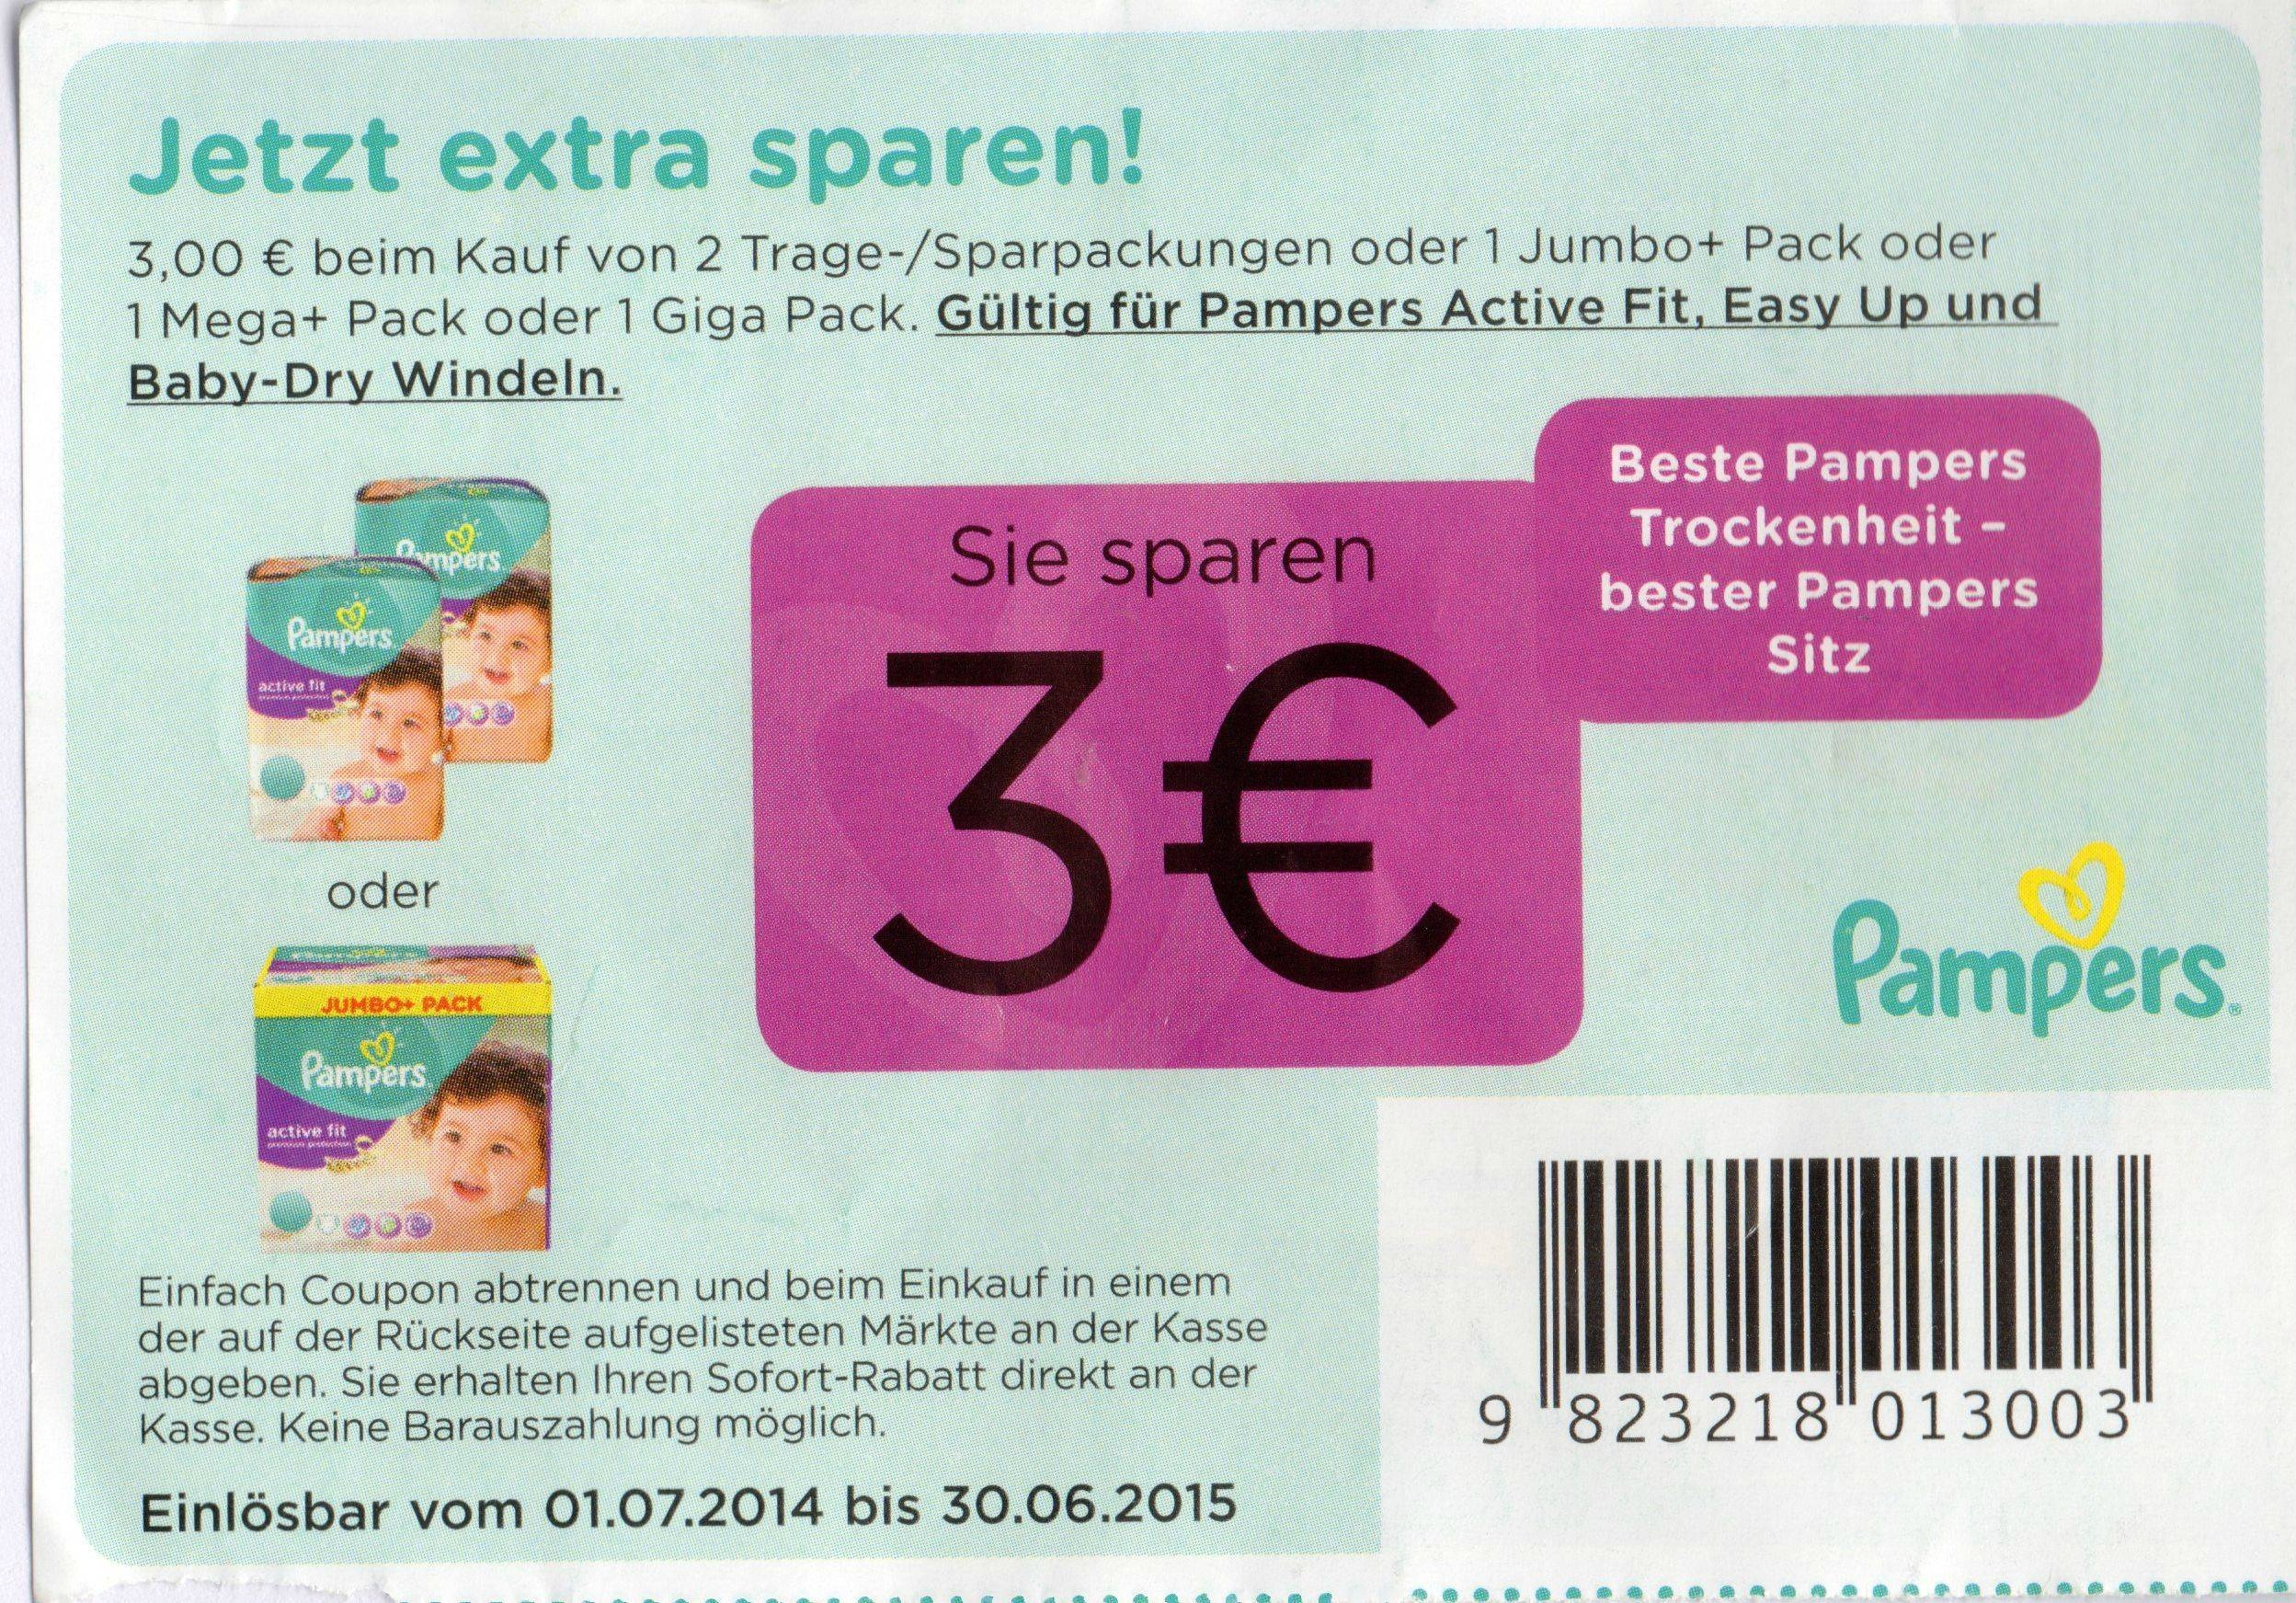 Pampers Coupons Zum Ausdrucken 2018 - Coupons Ob Tampons - Free Printable Spiriva Coupons